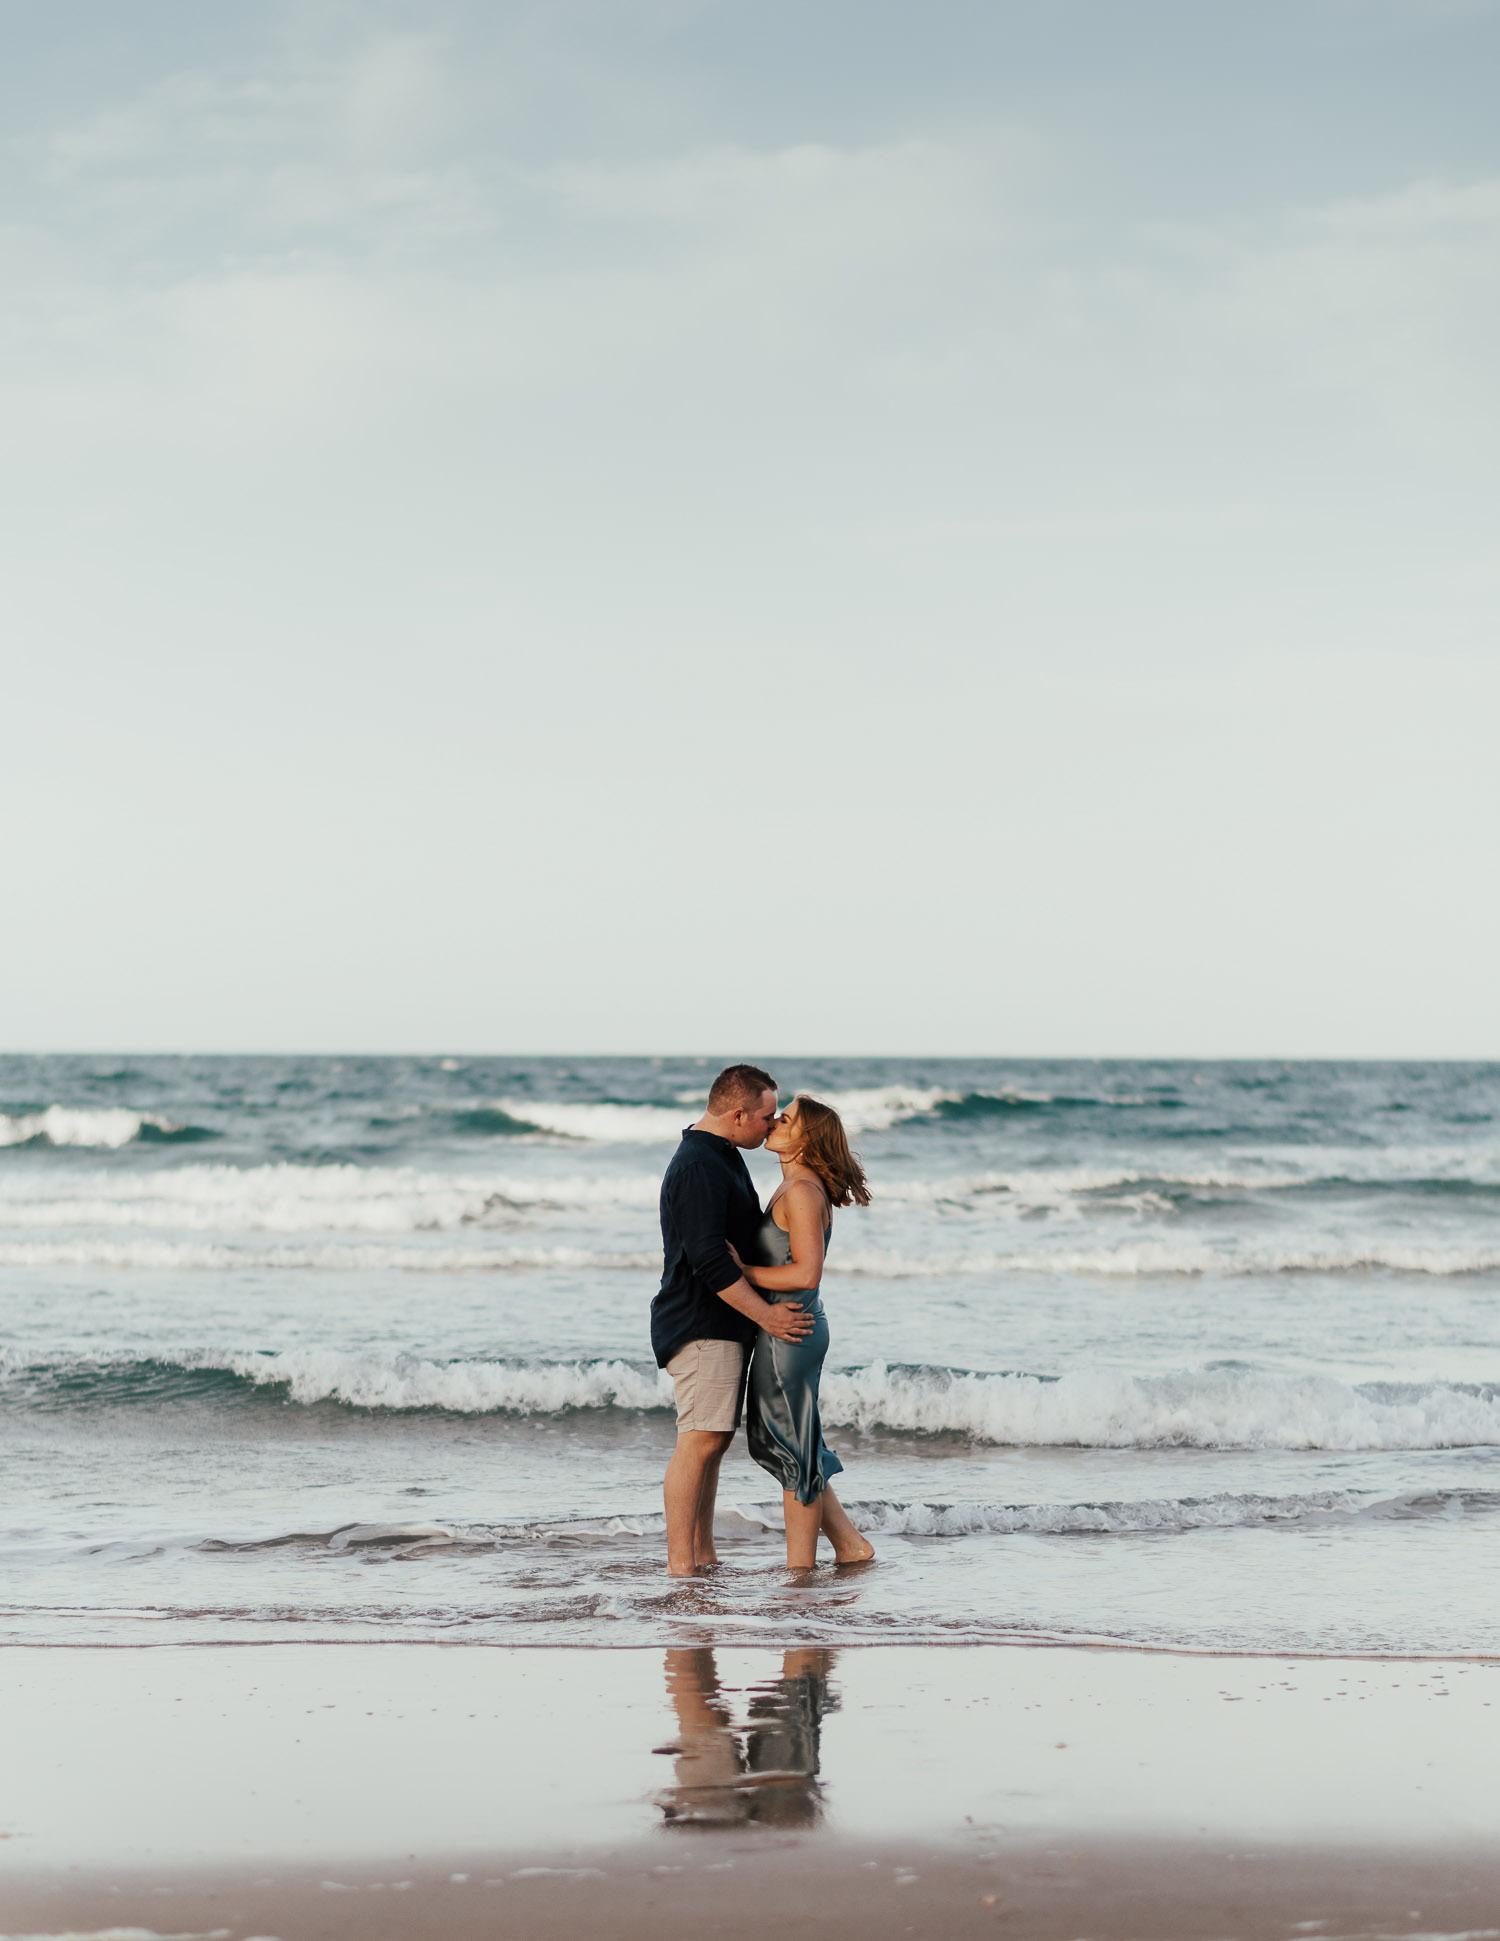 couple kissing at beach